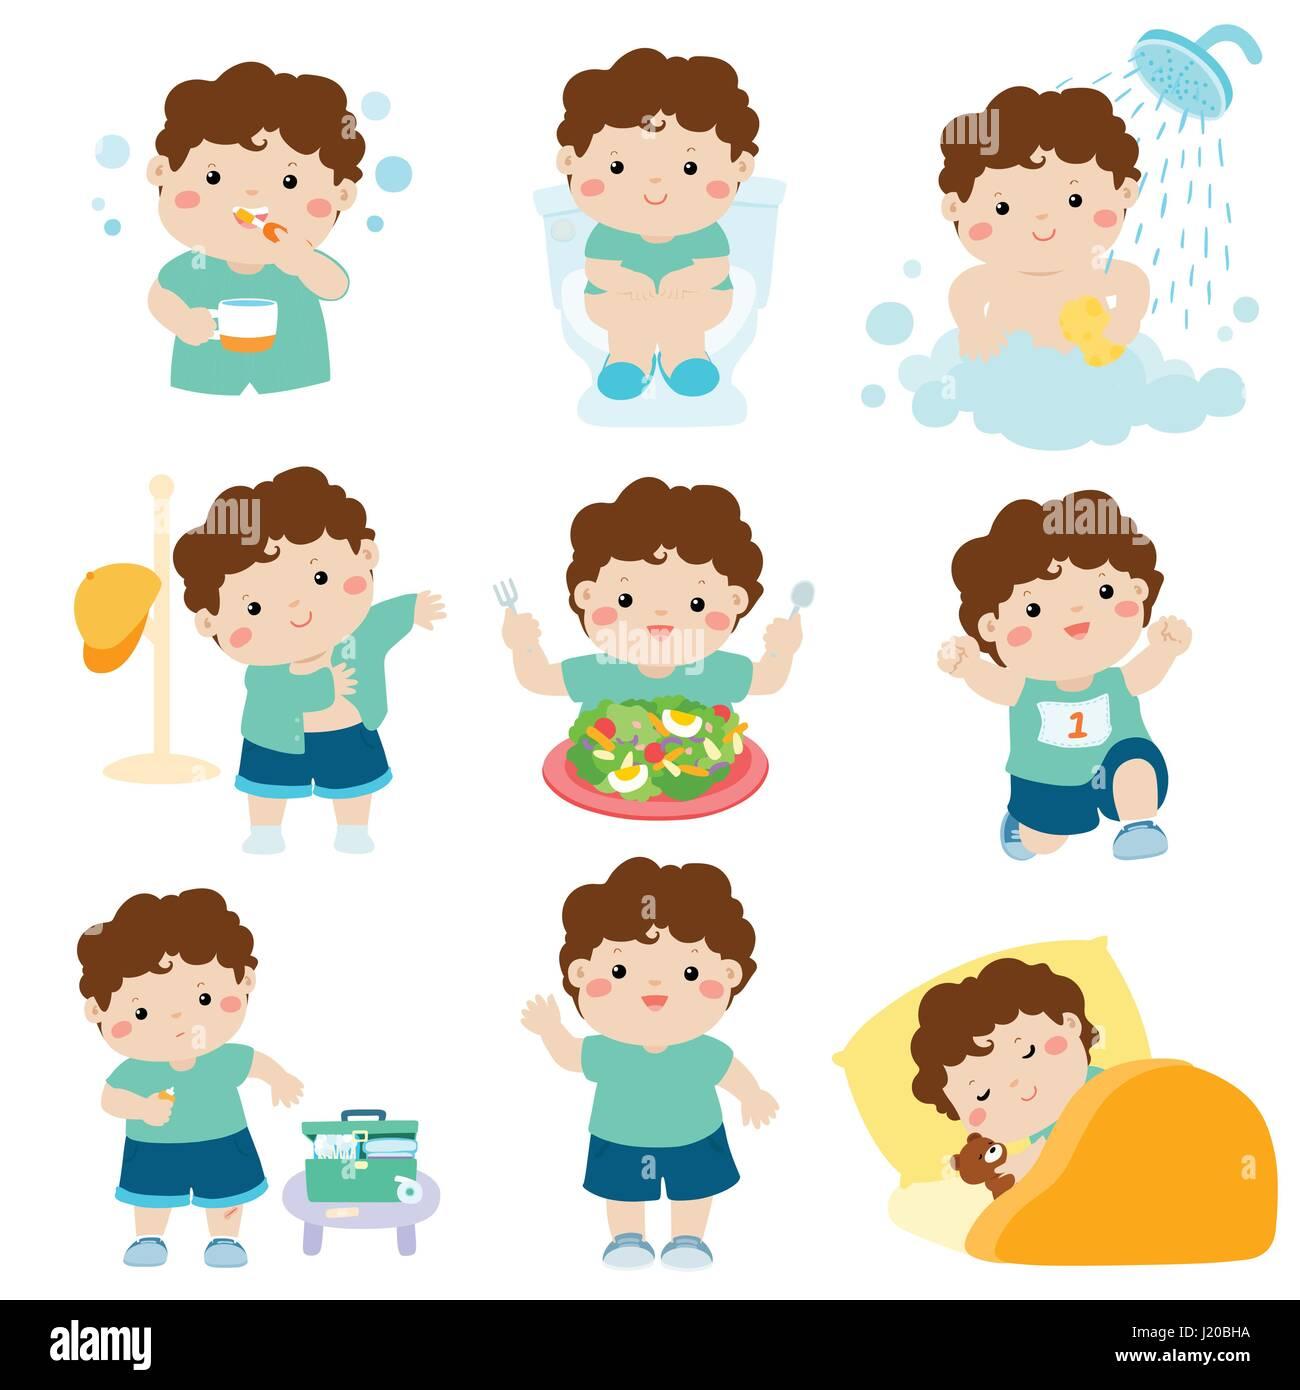 La Piel Marron Chico Lindo Tener Higiene Saludable Tomar